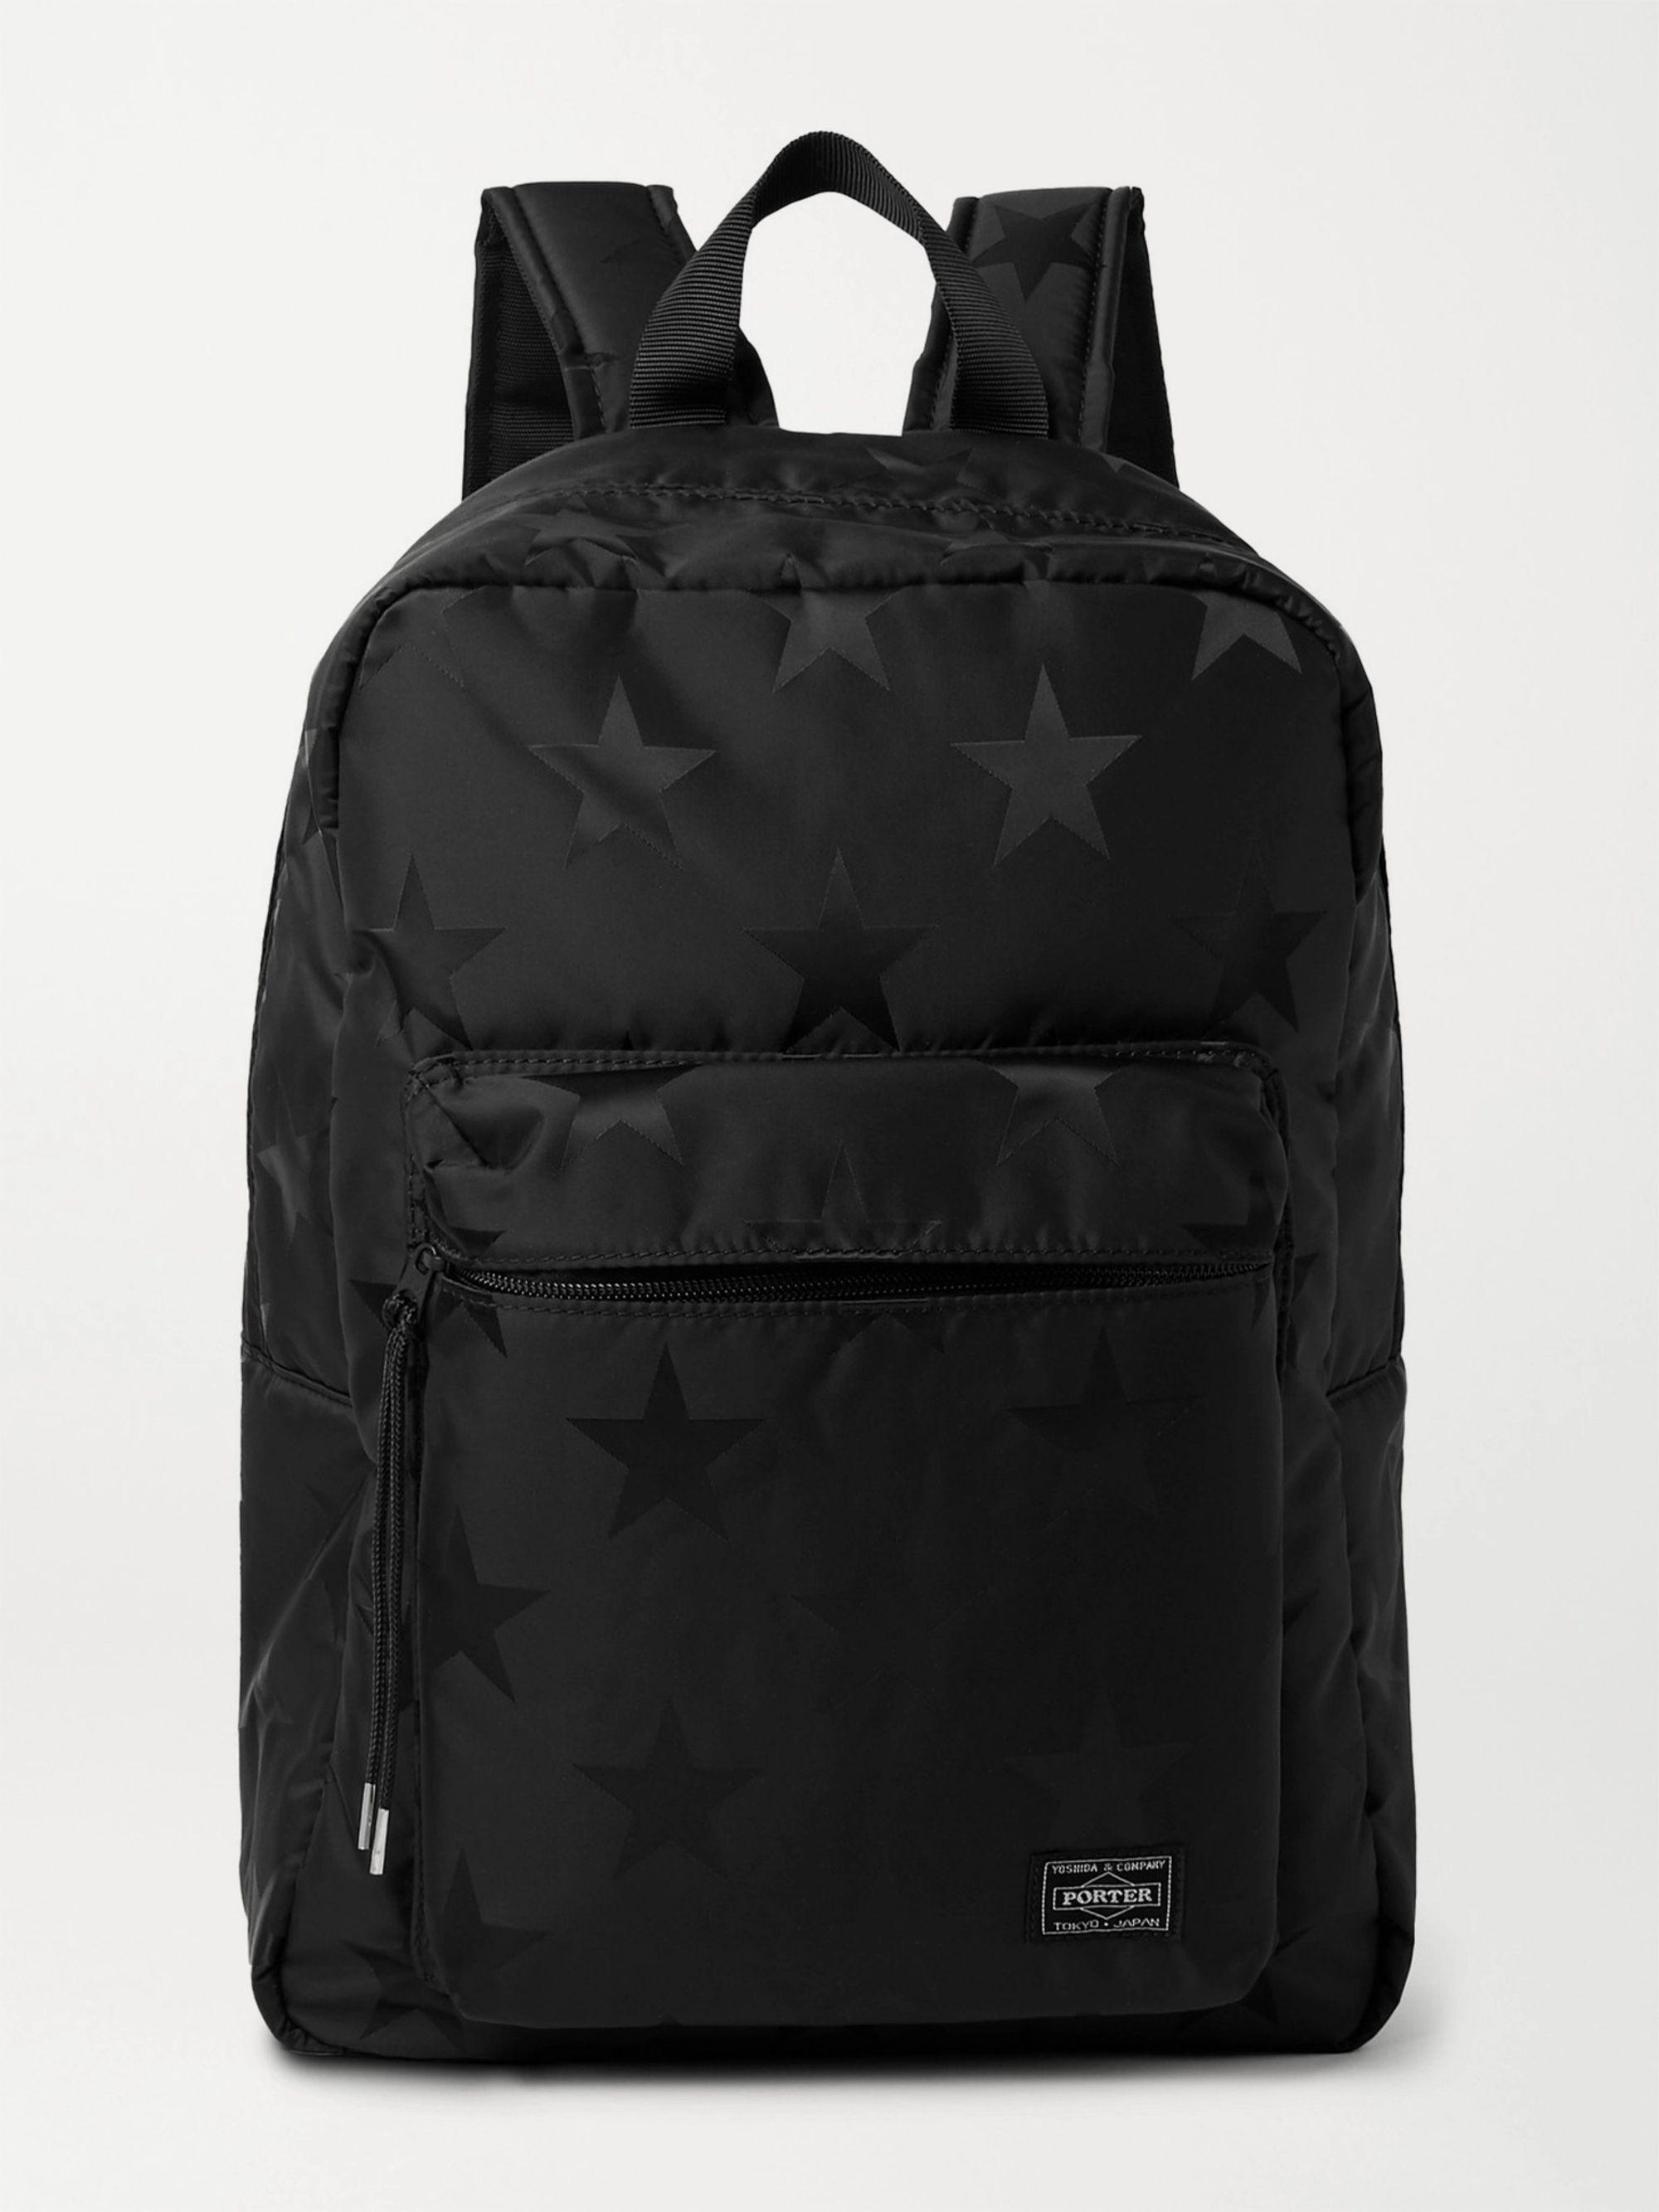 PORTER-YOSHIDA & CO Star-Print Nylon Backpack,Black